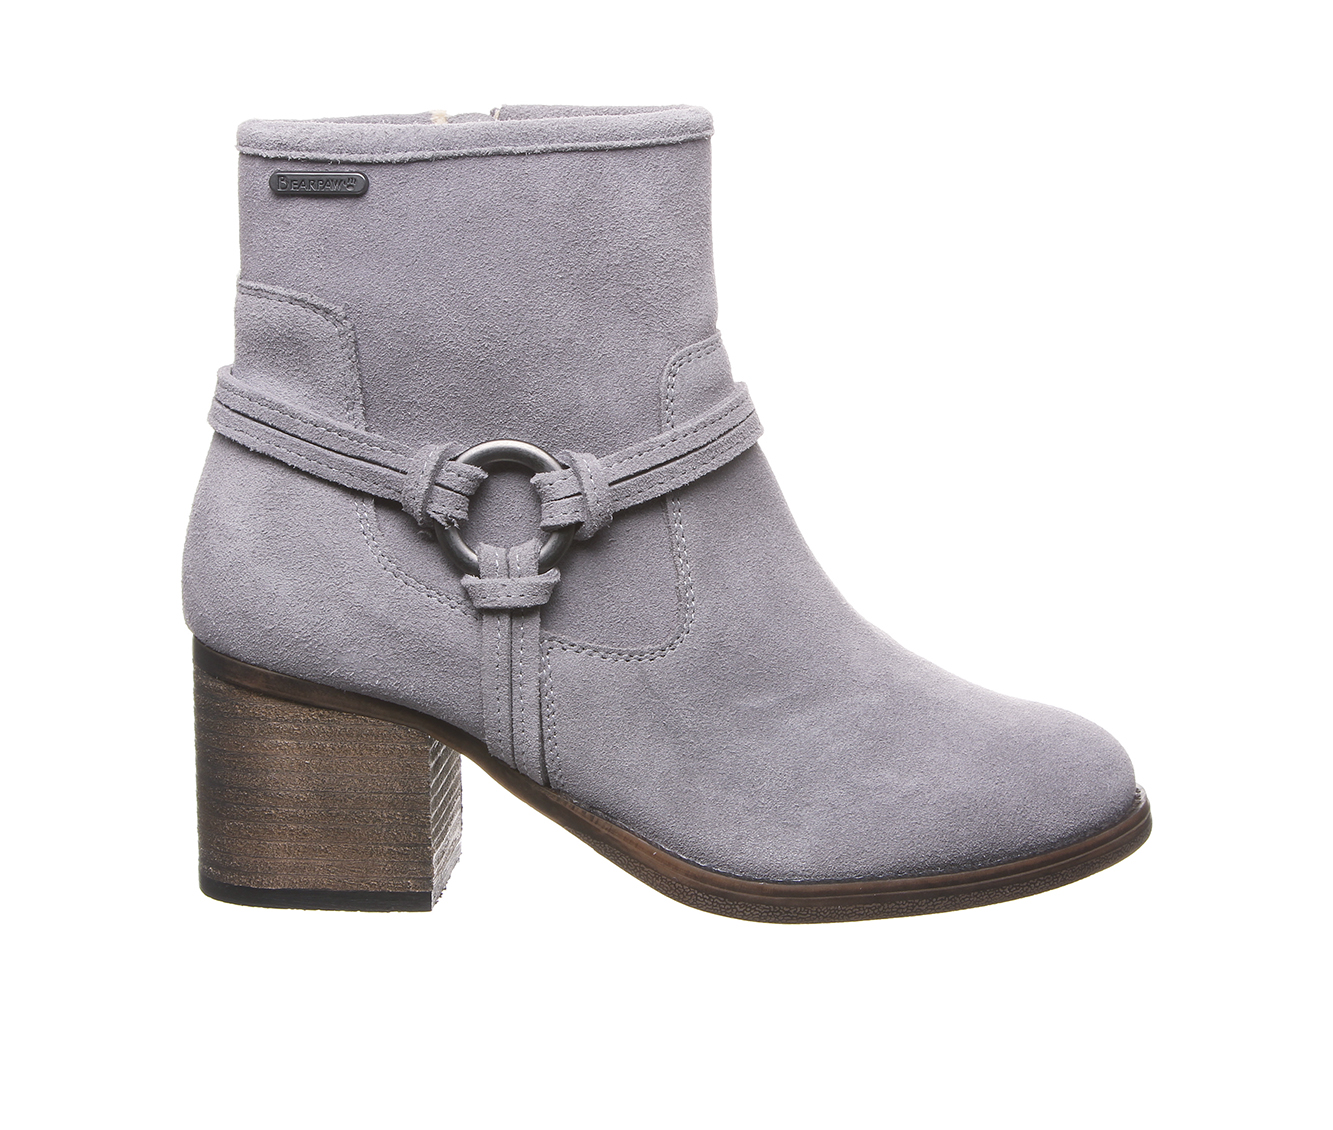 Bearpaw Mica Women's Boot (Gray Suede)